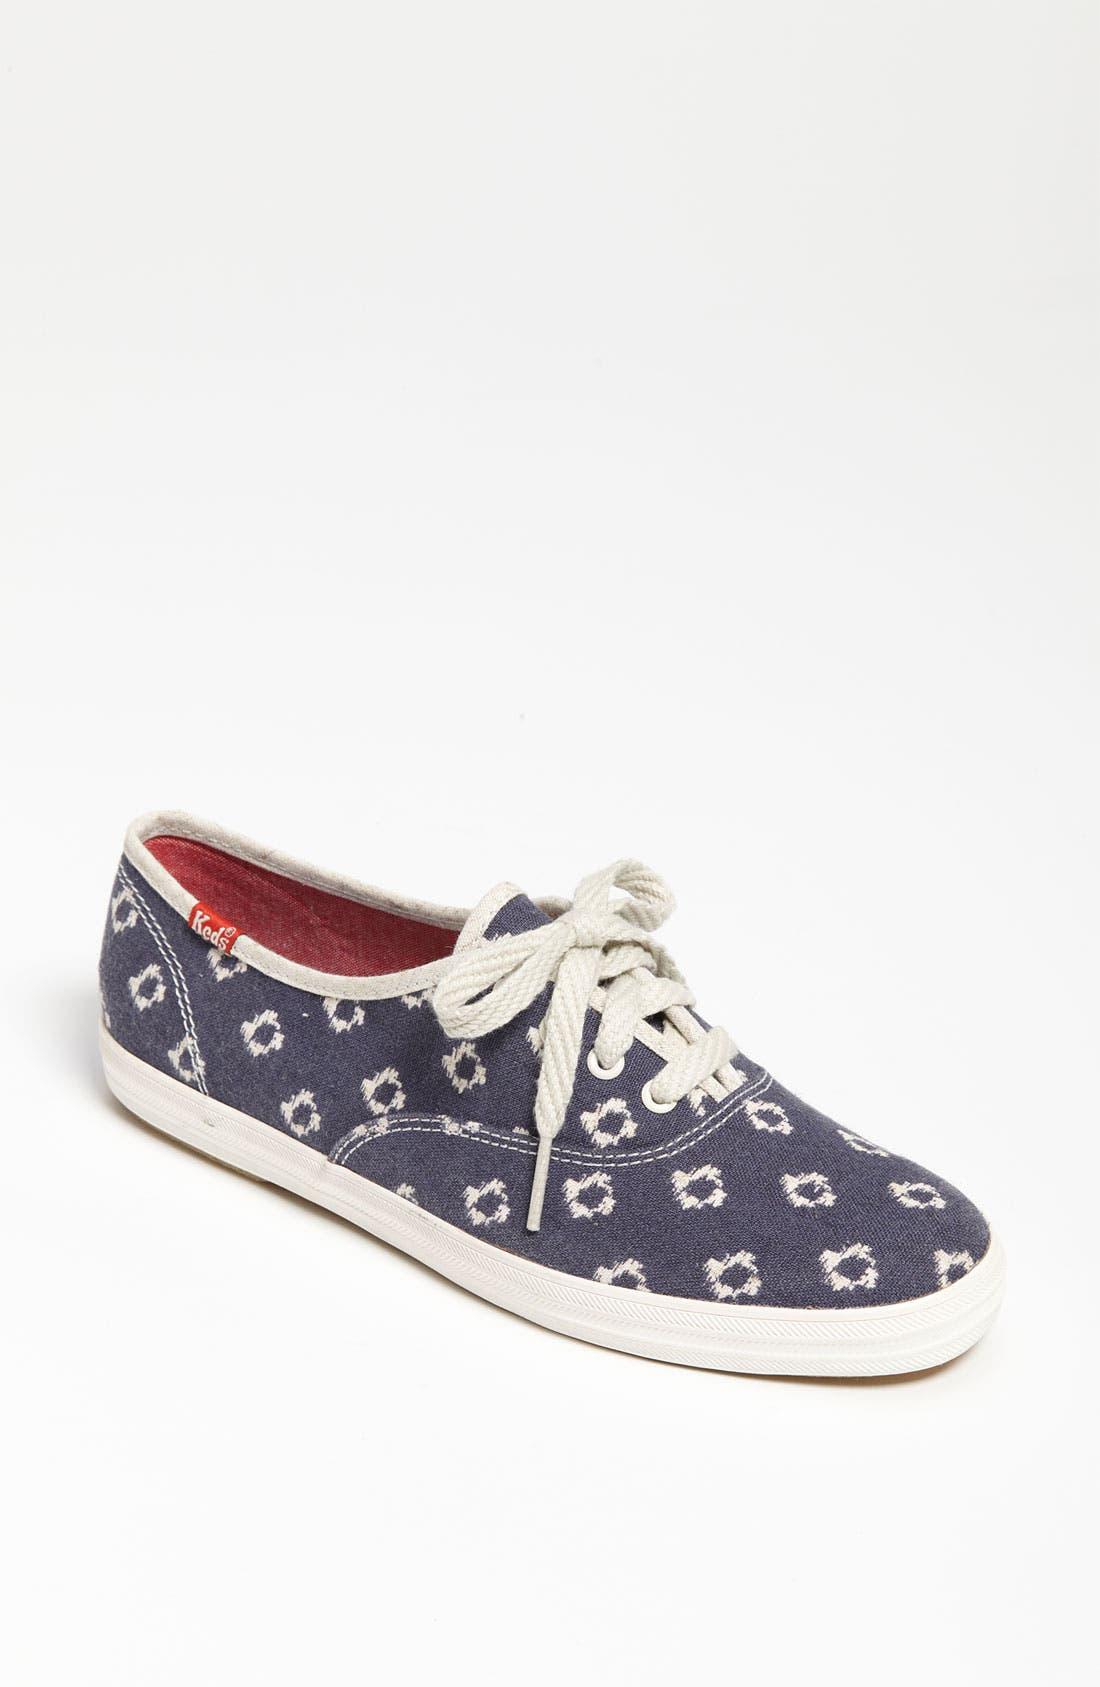 Alternate Image 1 Selected - Keds® 'Champion - Kimono Dot' Sneaker